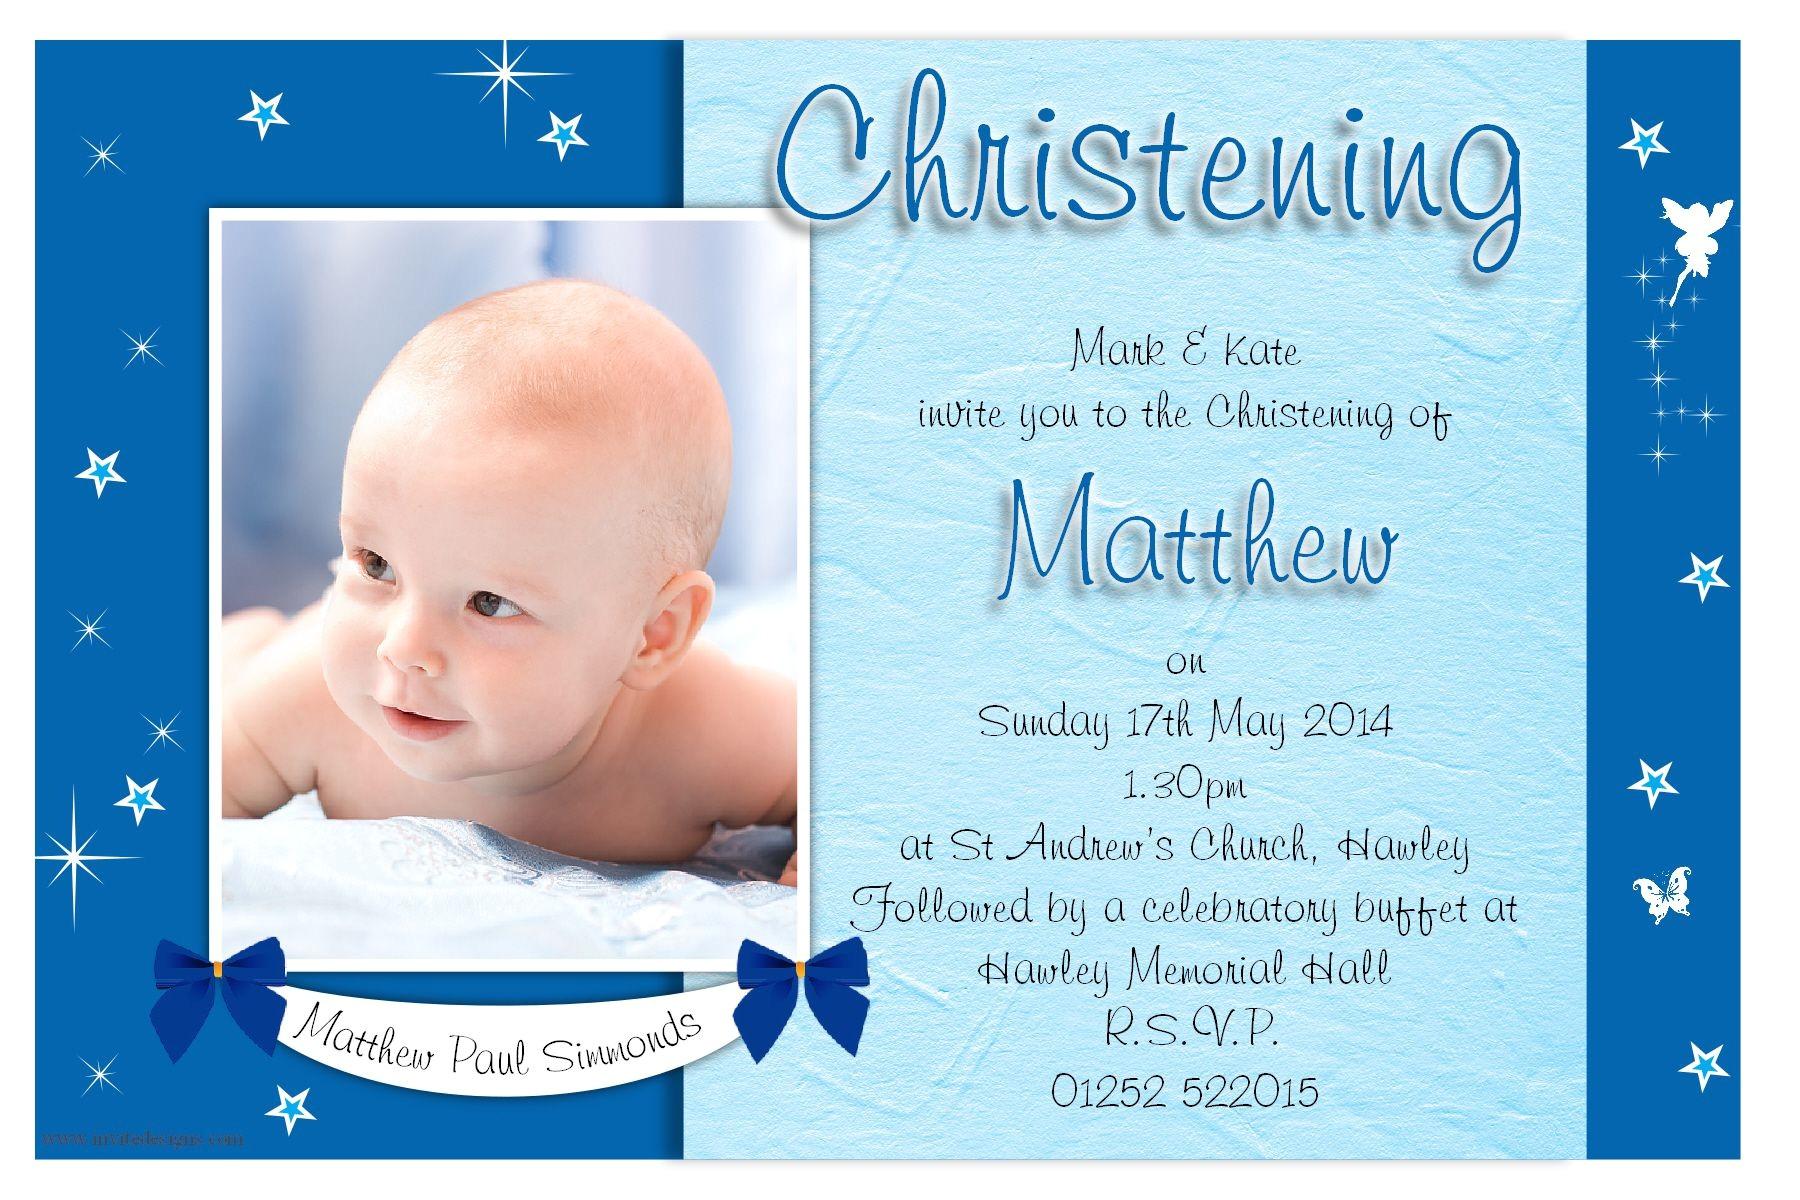 christening invitation cards for baby girl